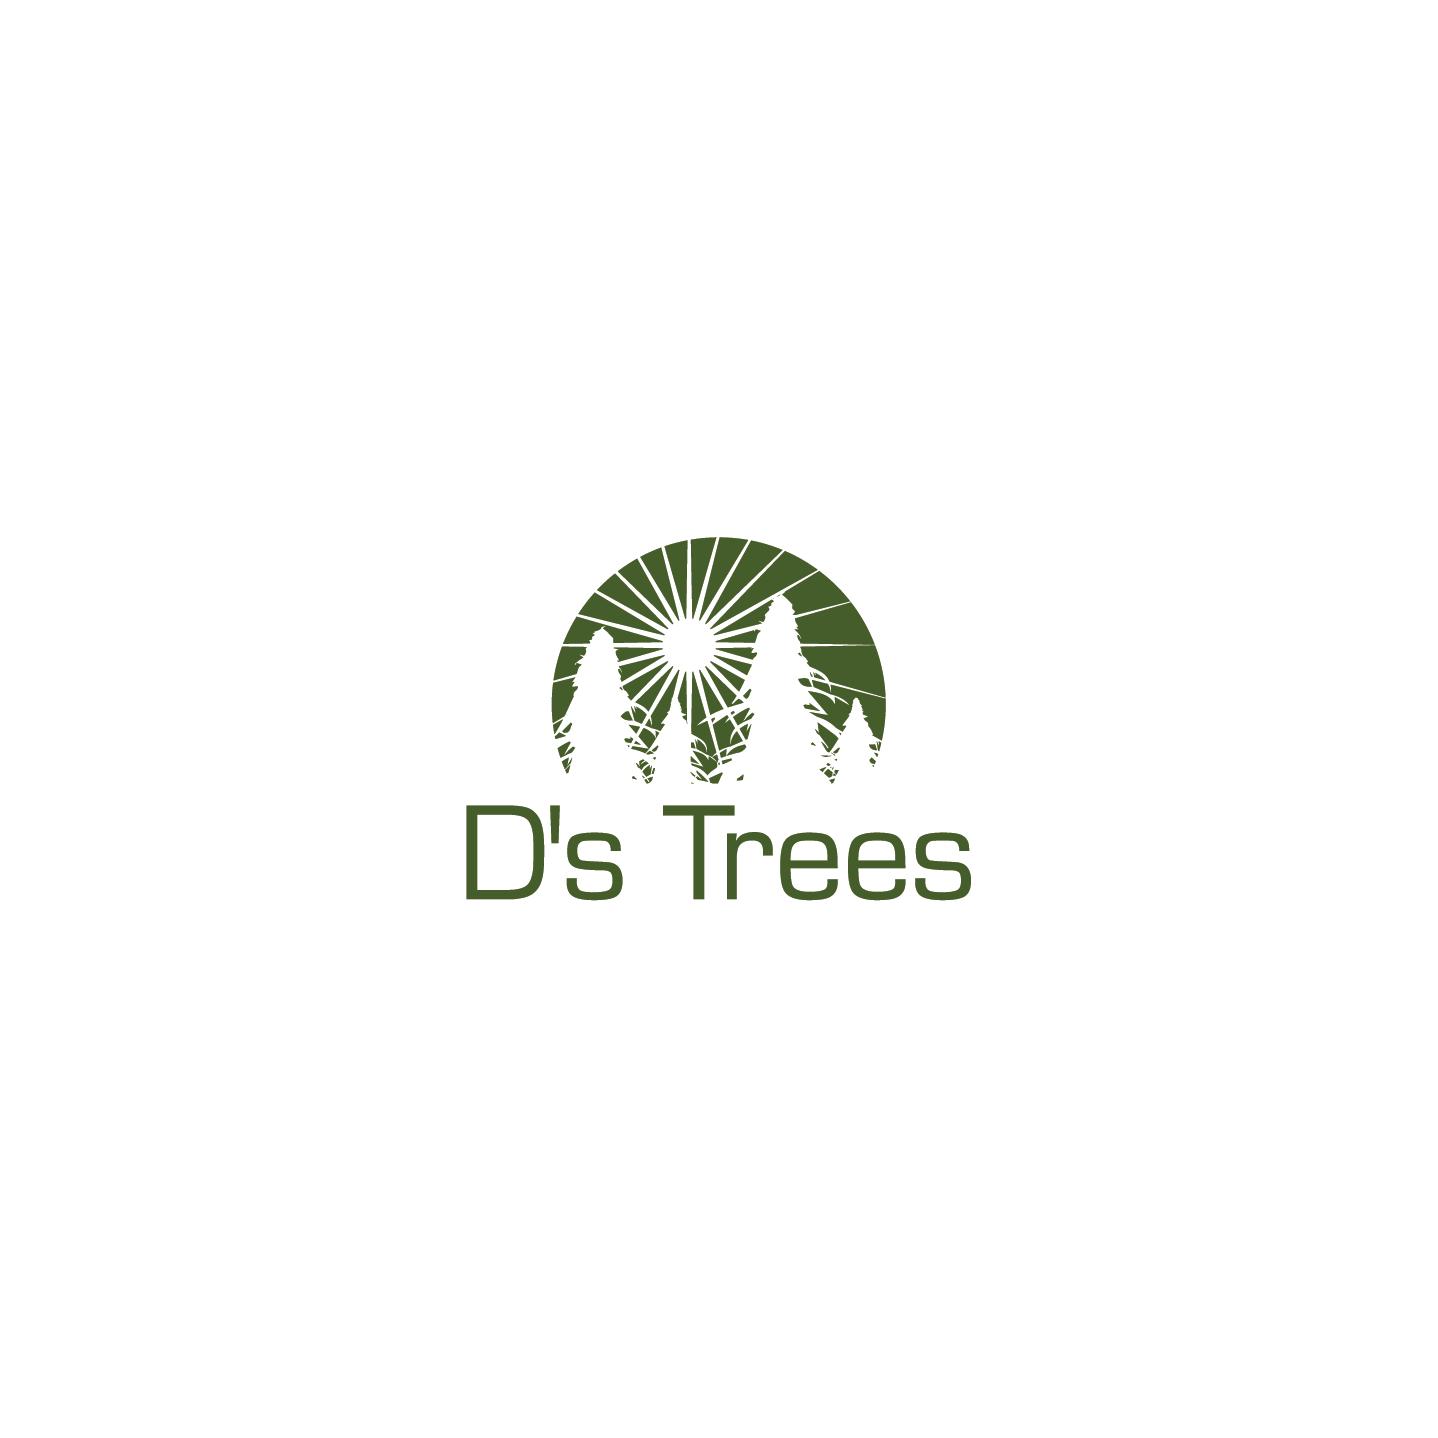 Create a hip/modern/elegant marijuana logo for D's Trees